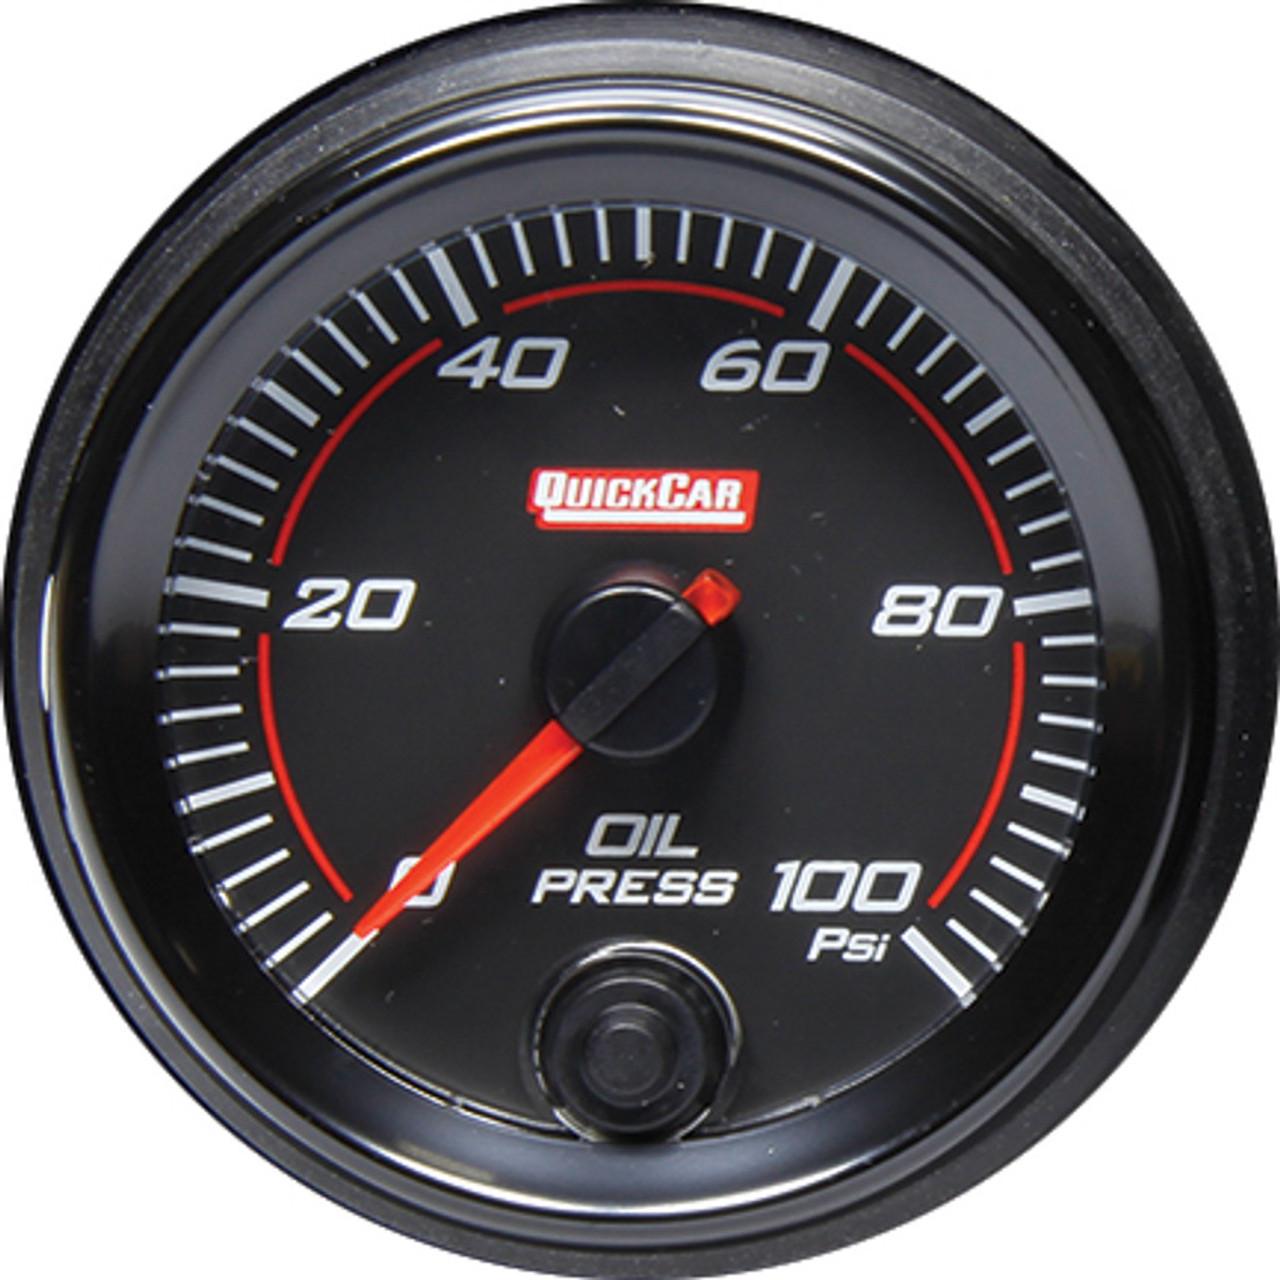 Quickcar Racing Products 67-003 Digital Oil Pressure Gauge